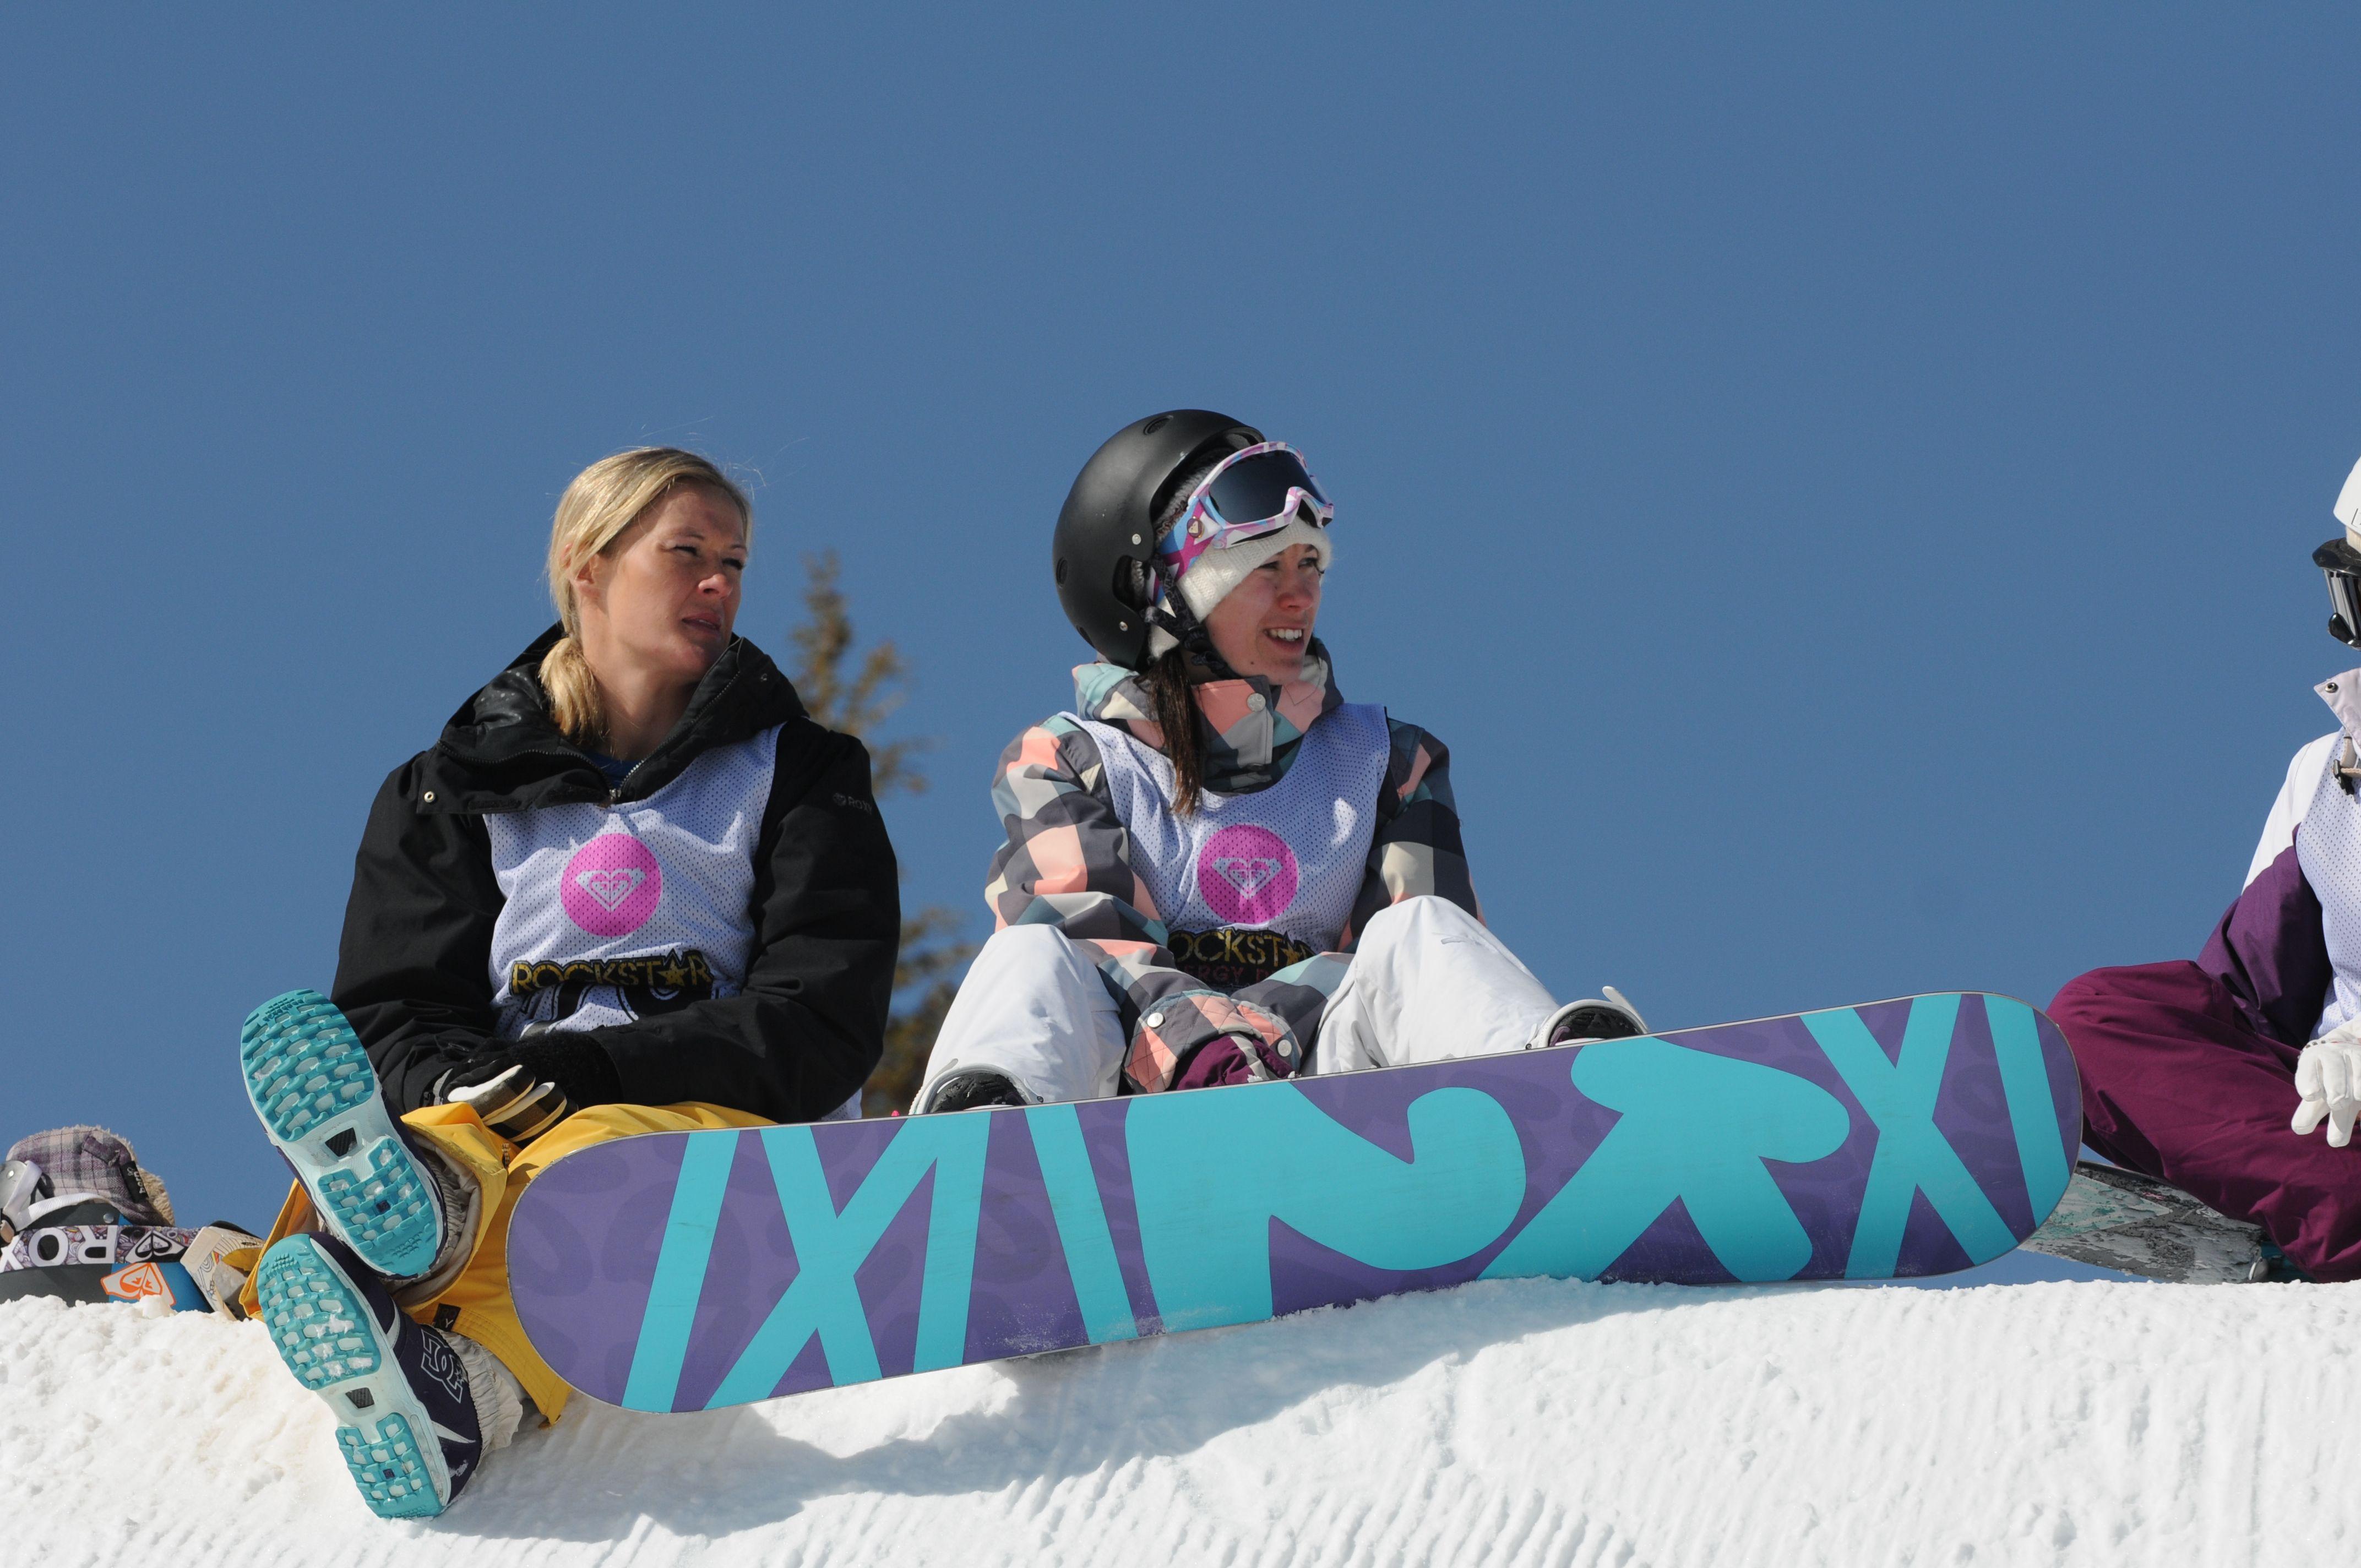 bc92cbc856 Roxy Girls Roxy Snowboard brand and lifestyle Roxy Snowboard team member  Roxy #ROXYsnow www.